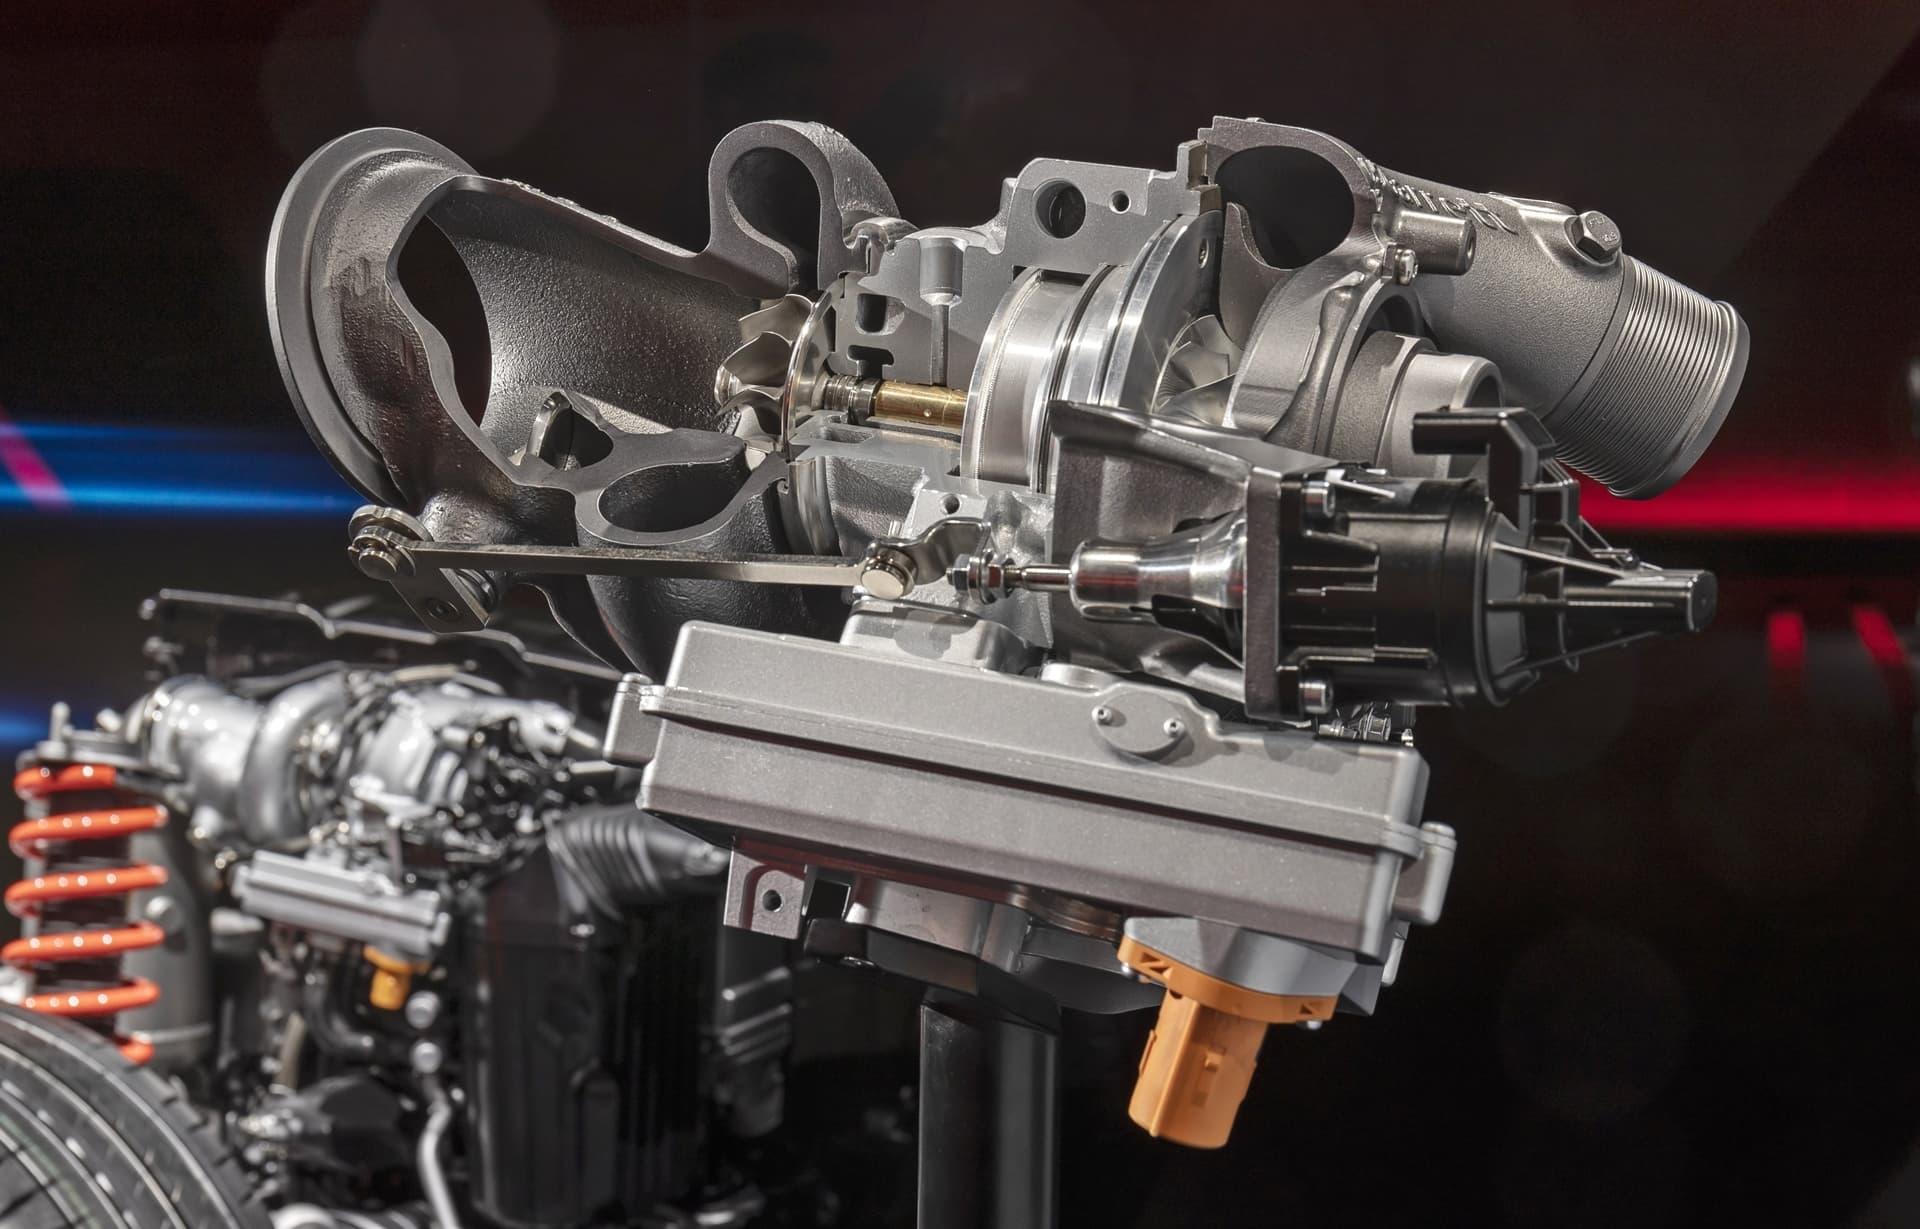 Mercedes Amg Motor Turbo Electrico 2021 0321 004